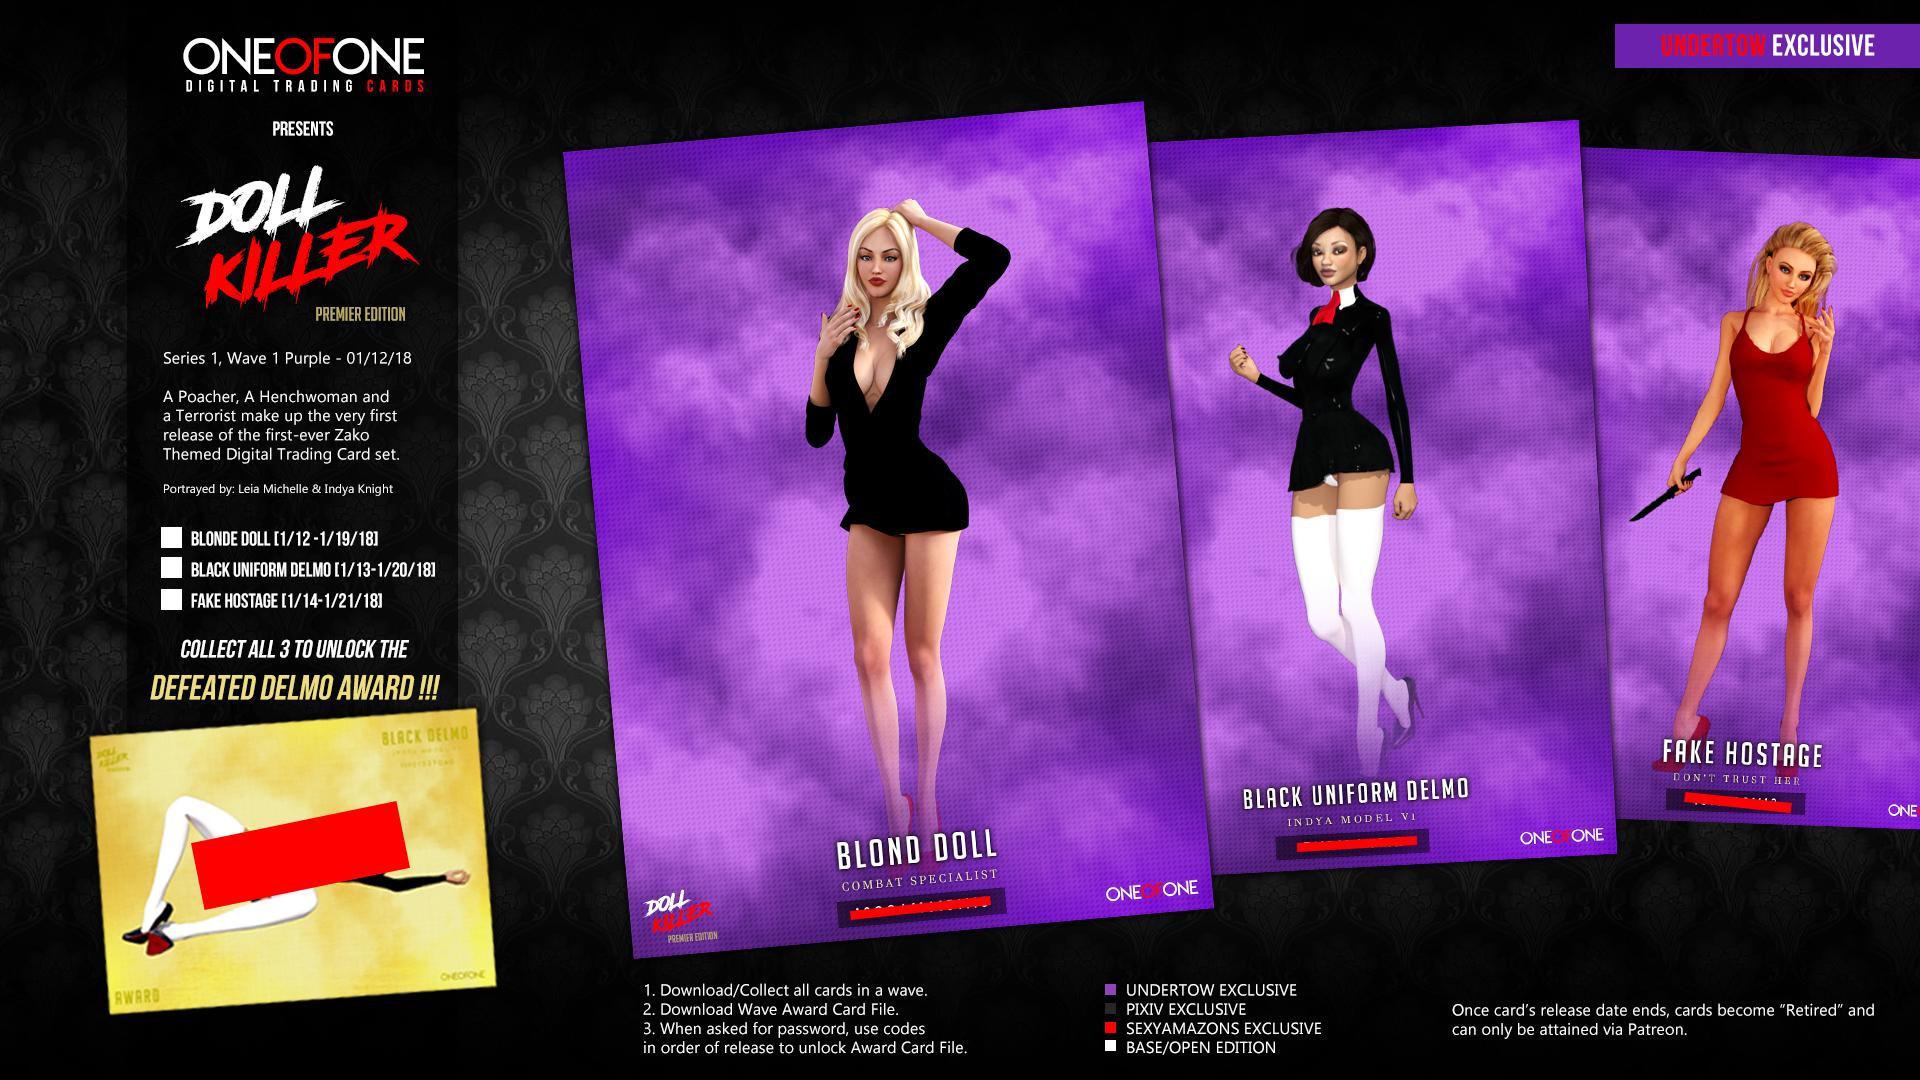 01-12-18-doll-killer-series-1-wave-1.jpg